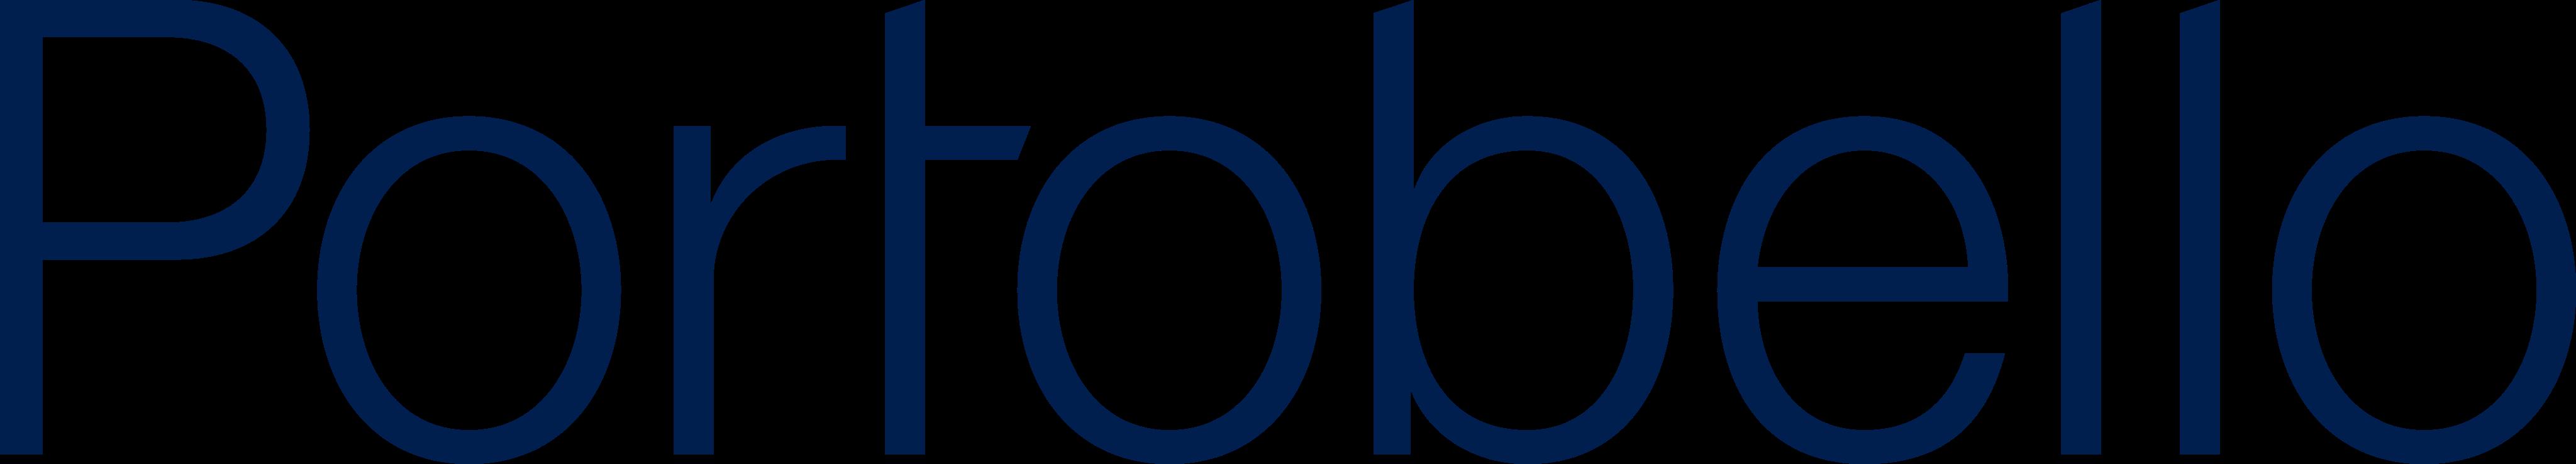 portobello logo 2 - Portobello Logo